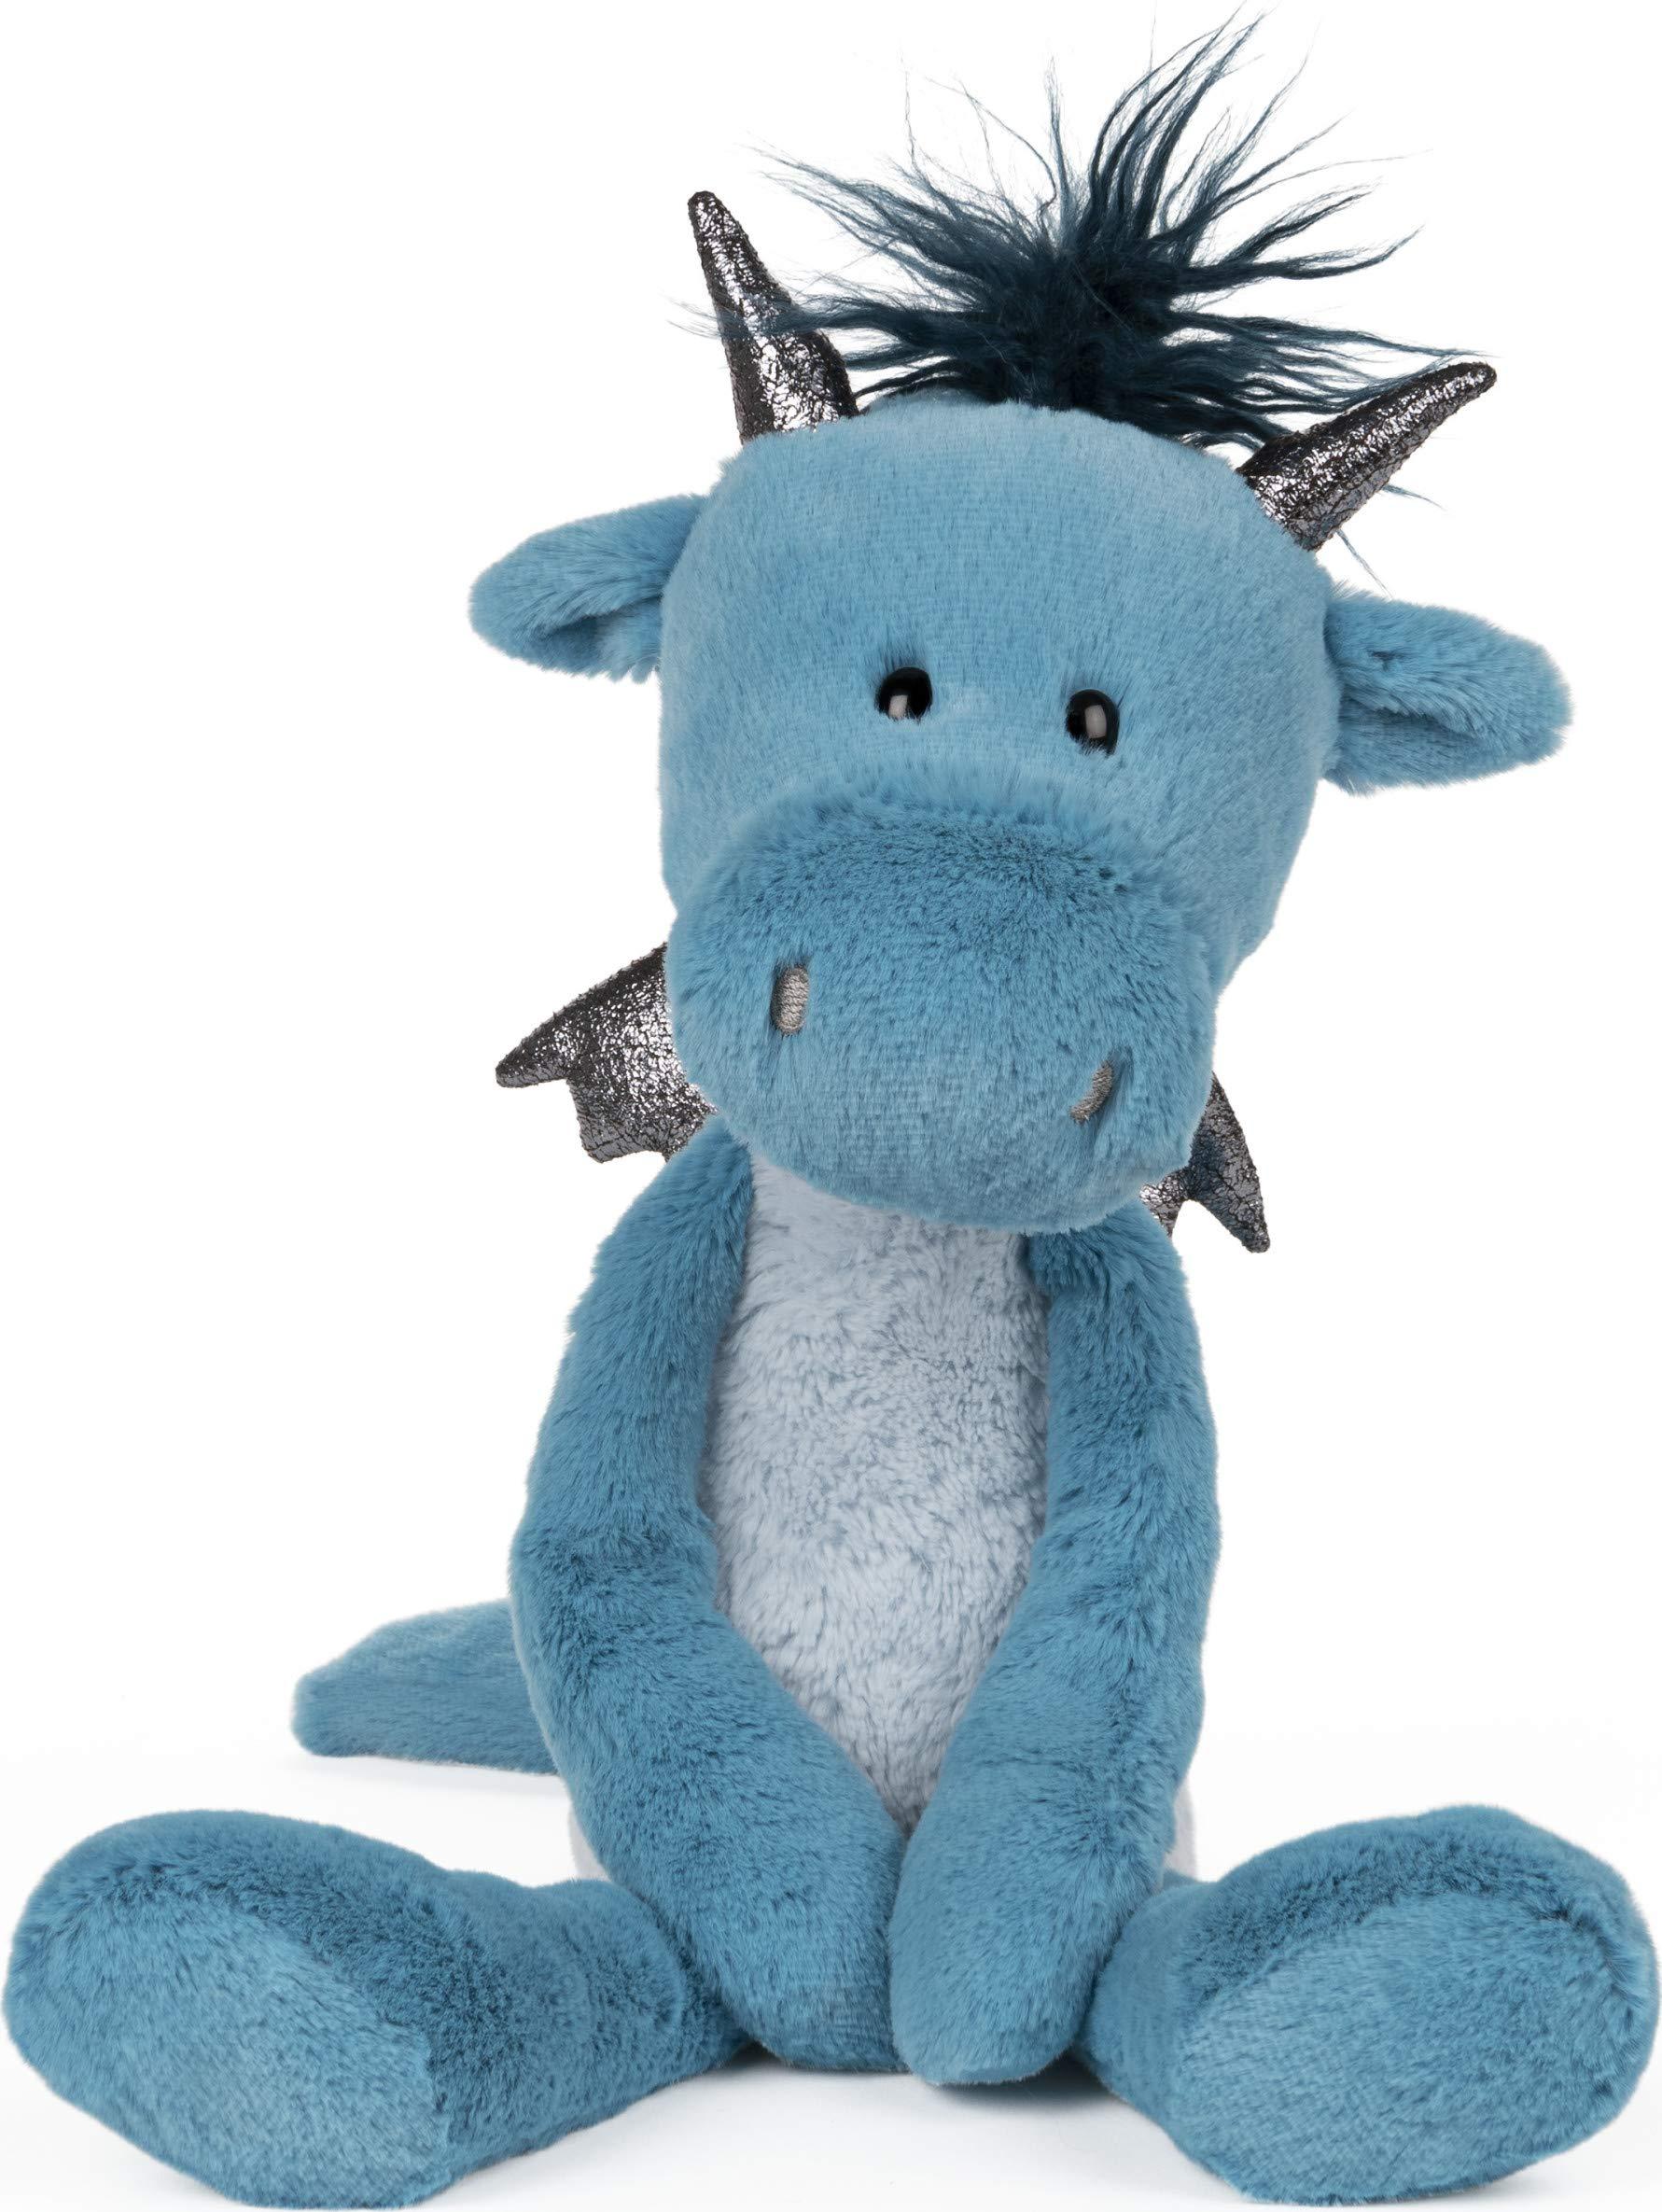 "GUND Toothpick Asher Dragon Plush Stuffed Animal, Blue, 15"""